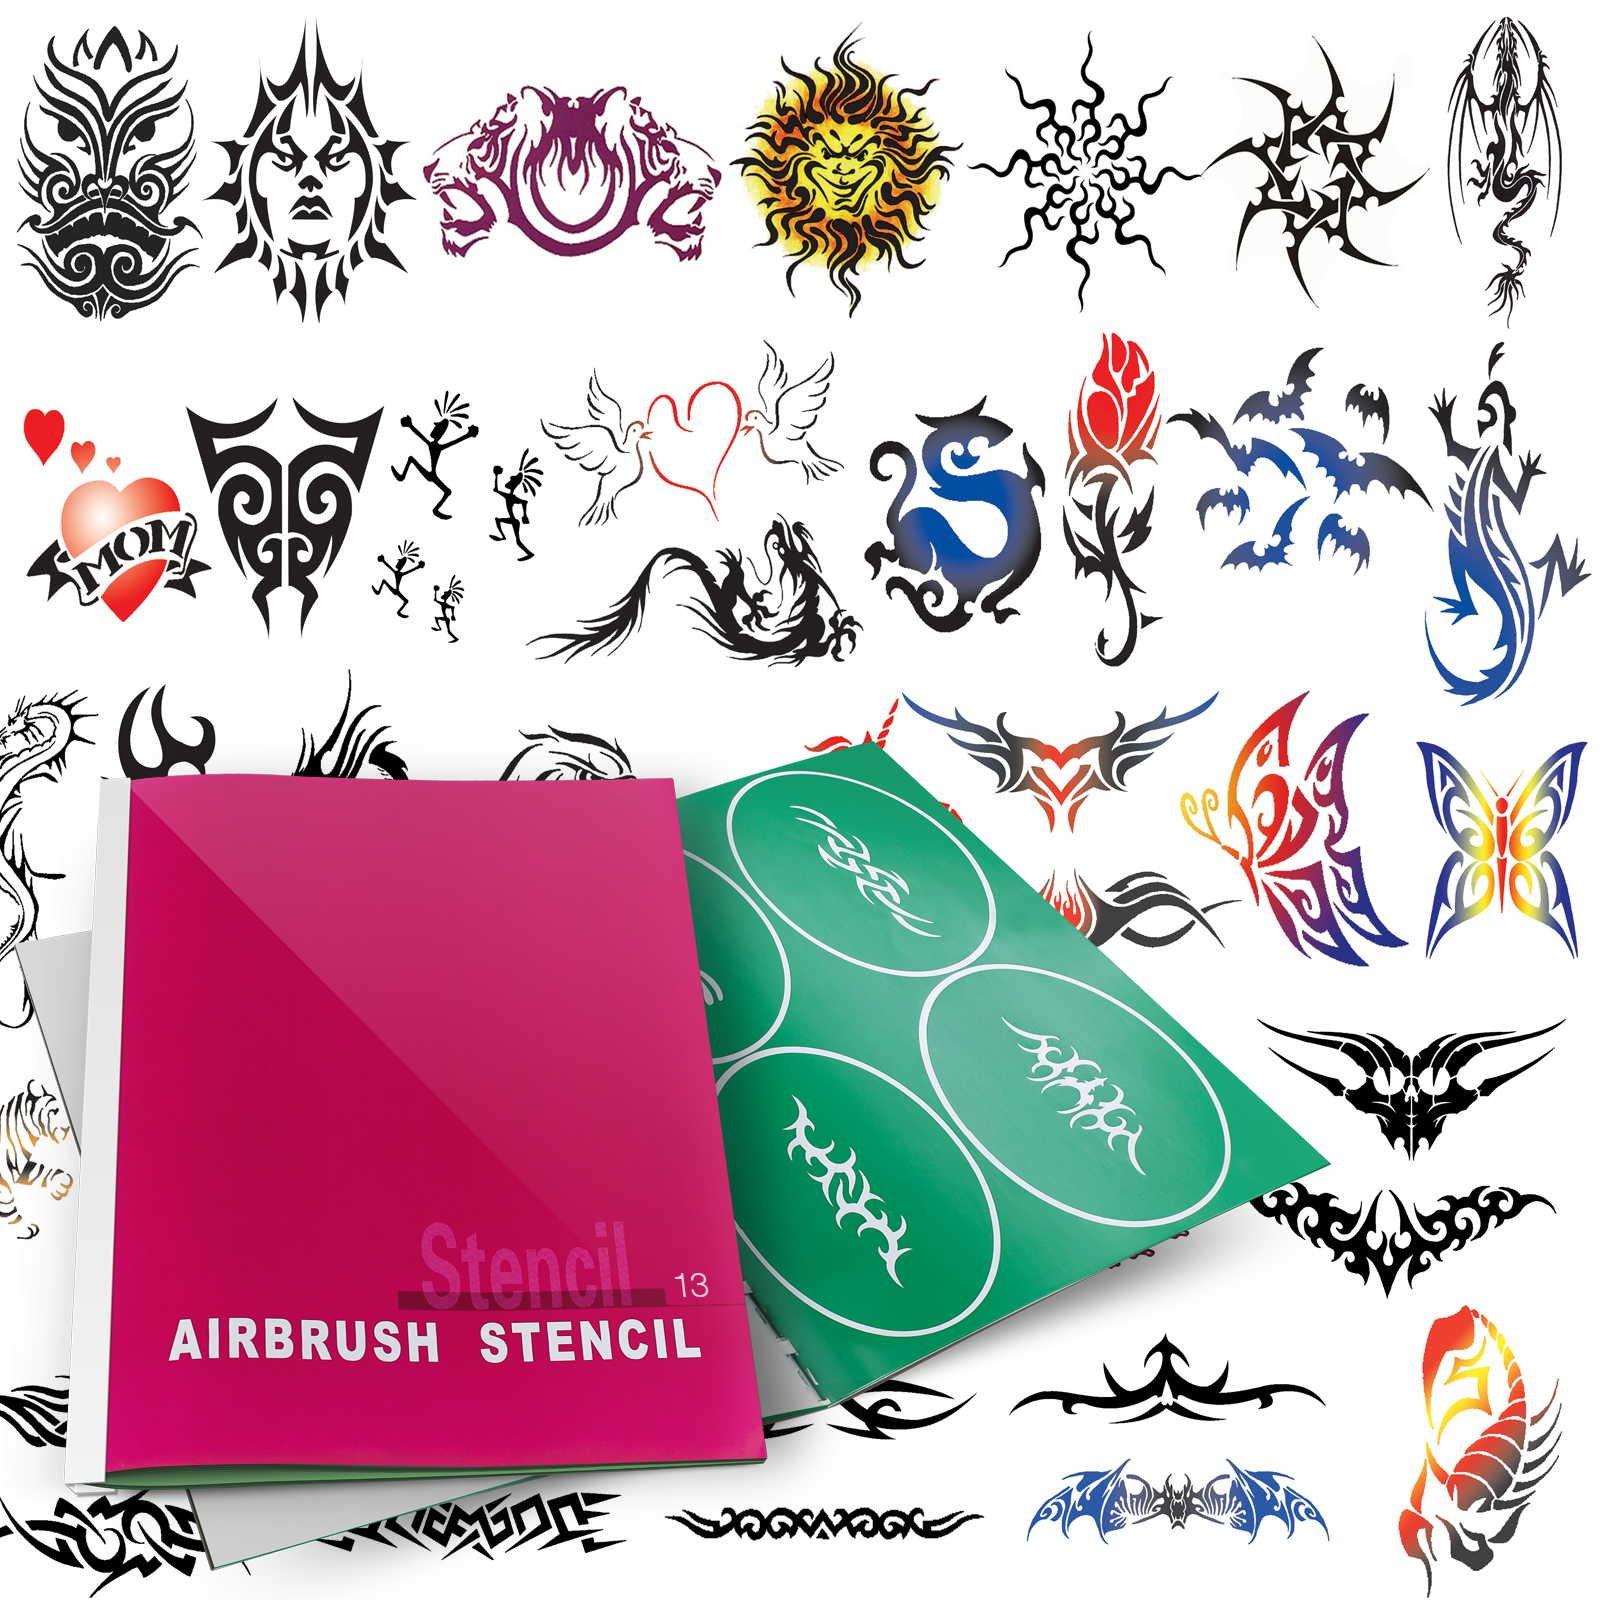 PointZero Temporary Tattoo Airbrush Stencils 53 Designs - Book 13 by PointZero